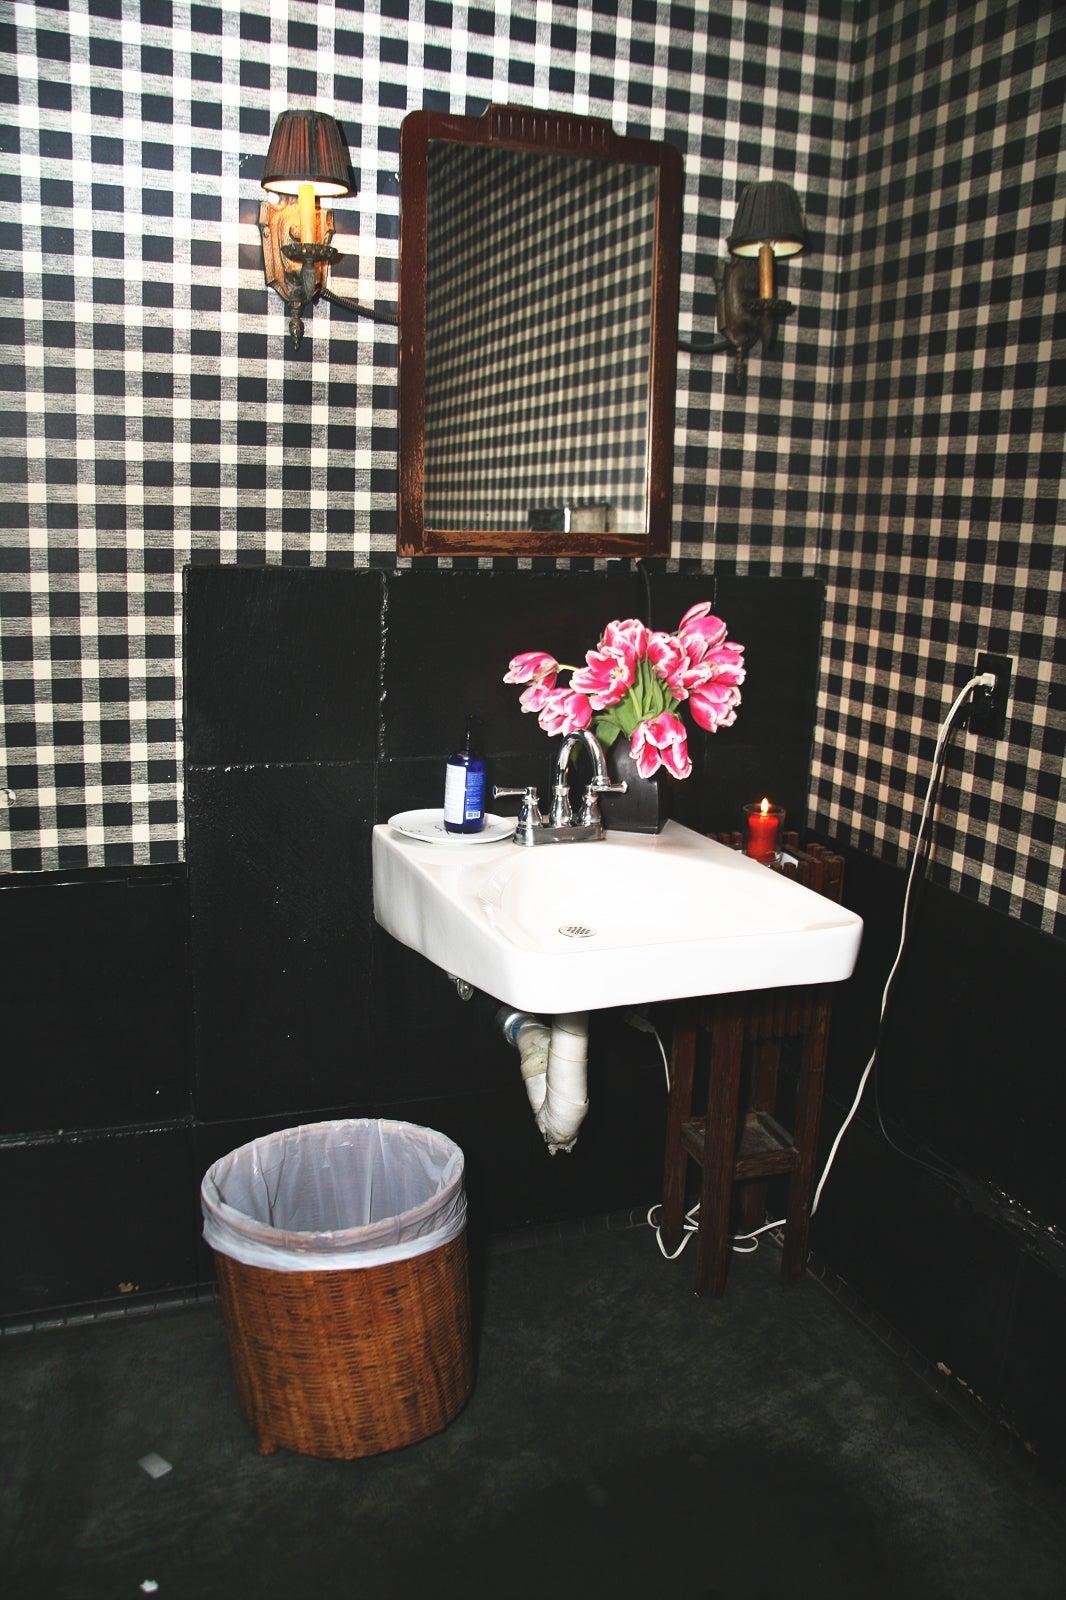 Coolest Bathrooms San Francisco Best Restaurant Bathrooms San Franci - Best-bathrooms